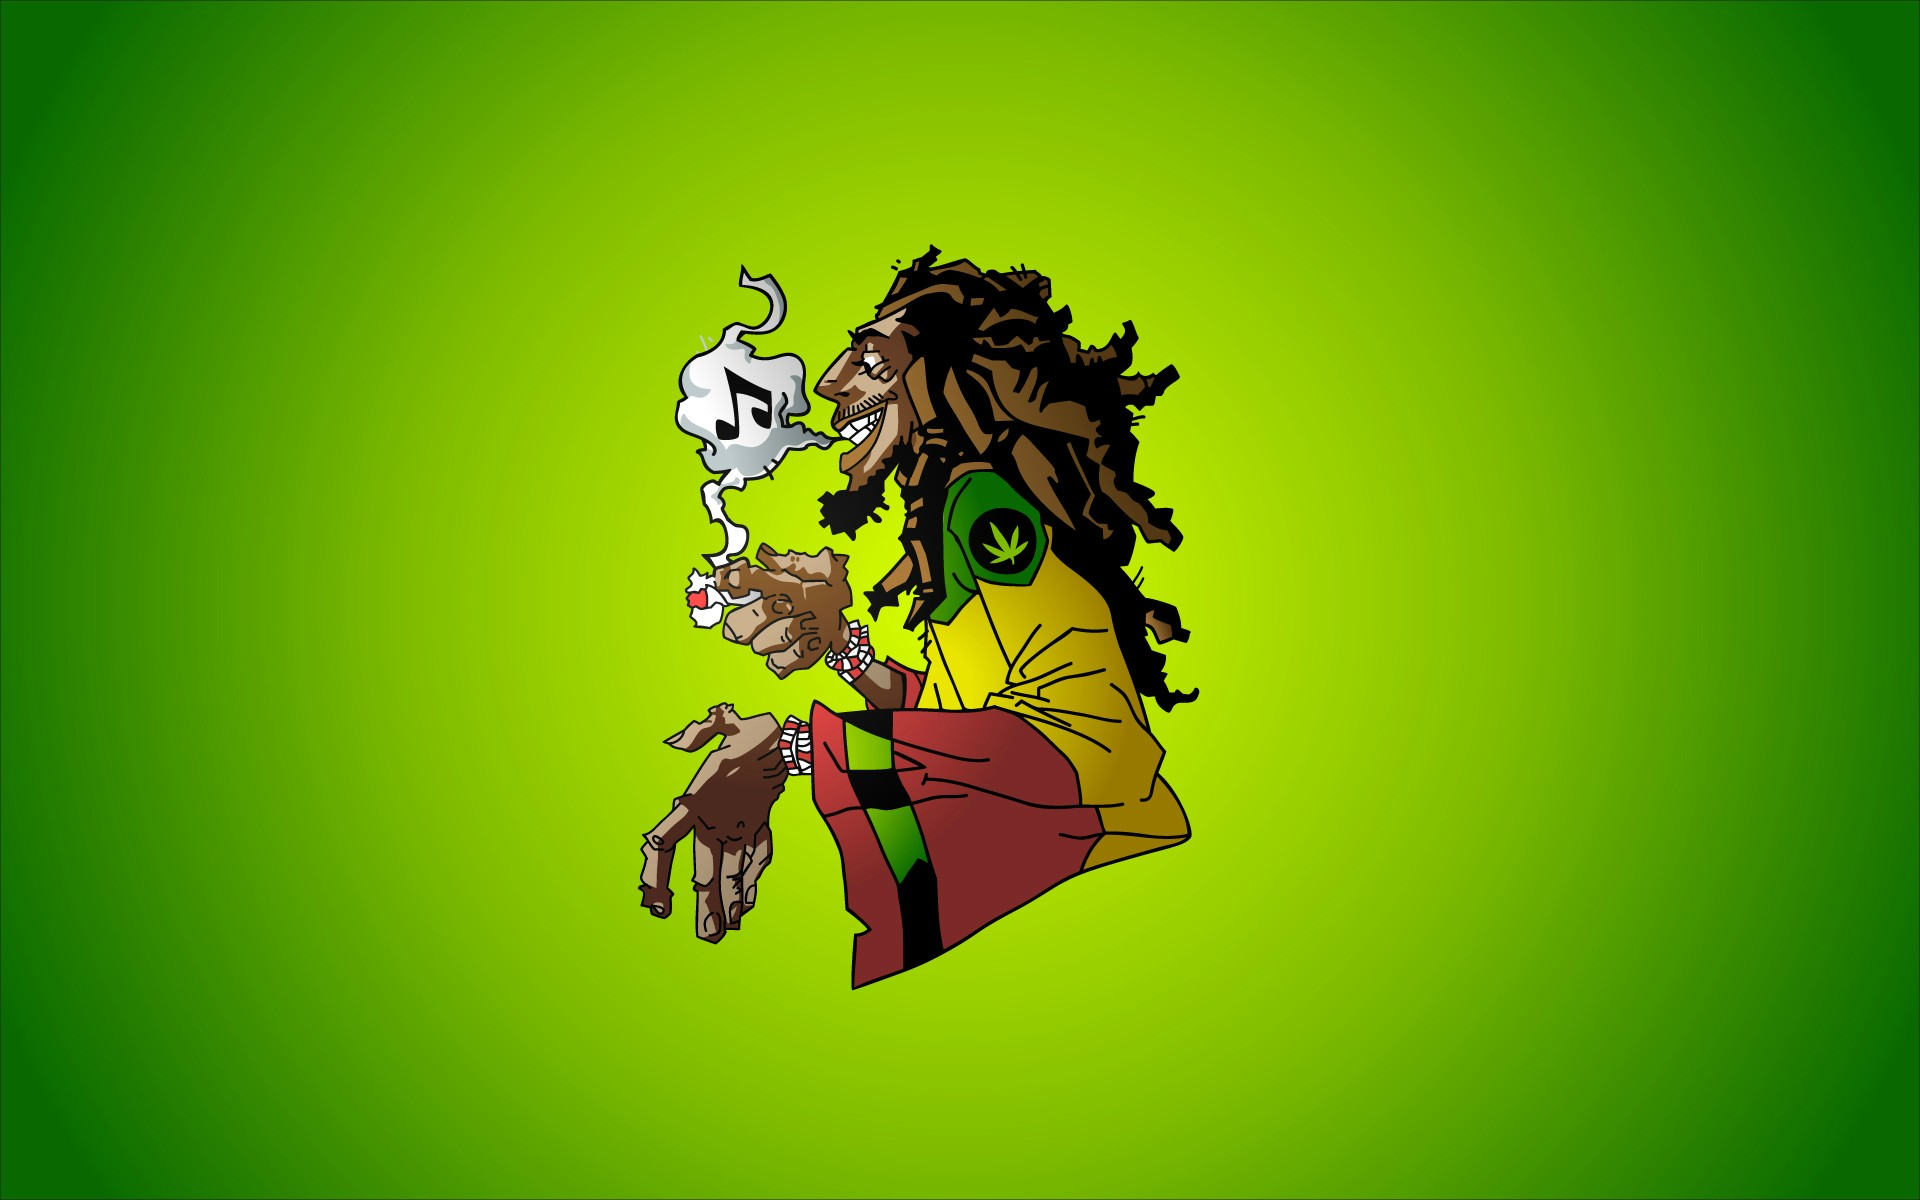 Rasta Music Bob Marley HD Wallpaper. Rasta Music Bob Marley HD wallpaper